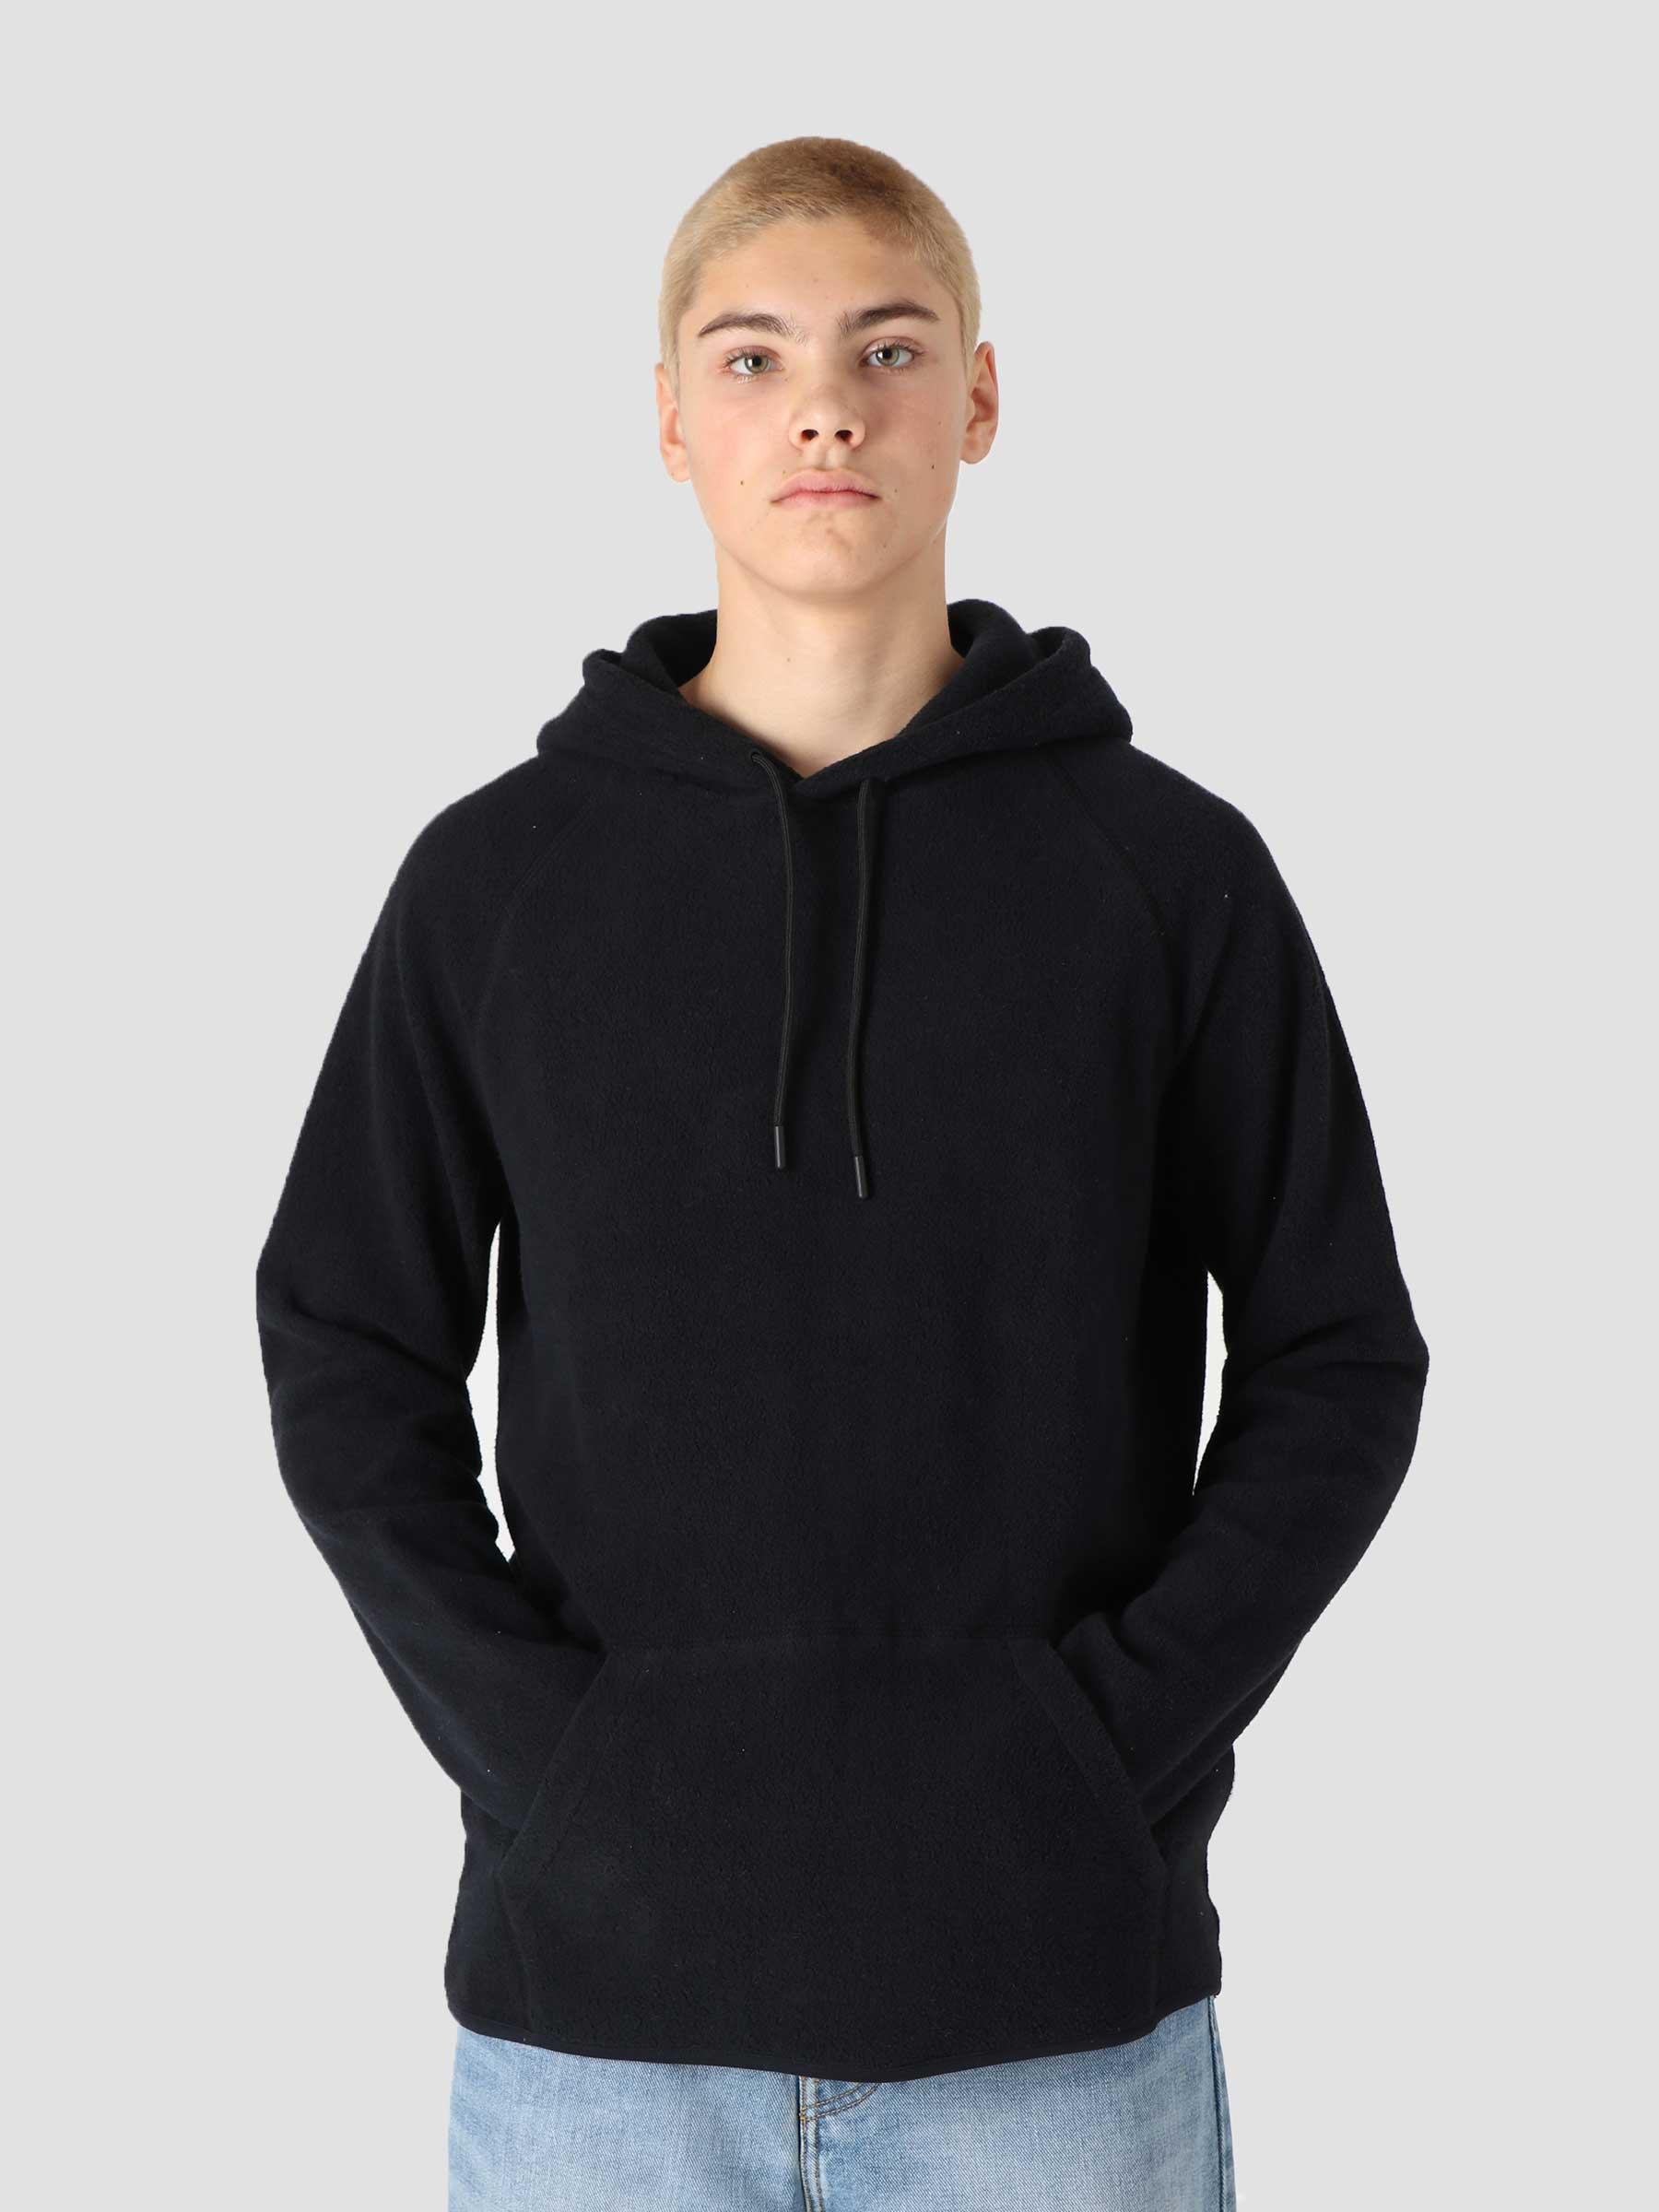 QB933 Raglan Fleece Hoodie Black